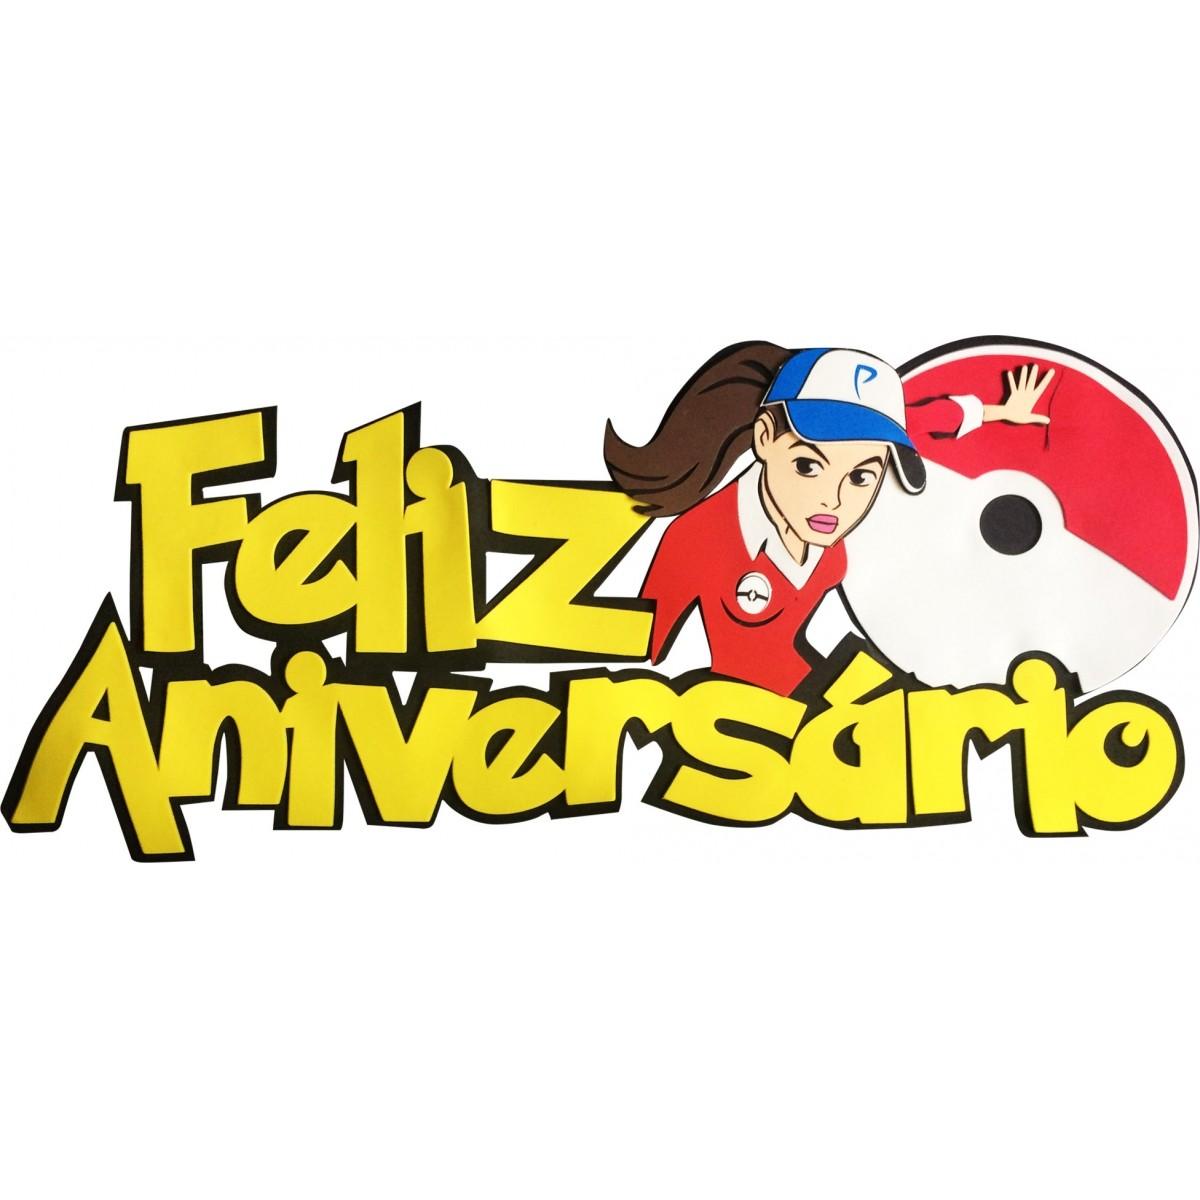 GAME GO FAIXA FELIZ ANIVERSARIO MENINA   68,0X29,0CM  -